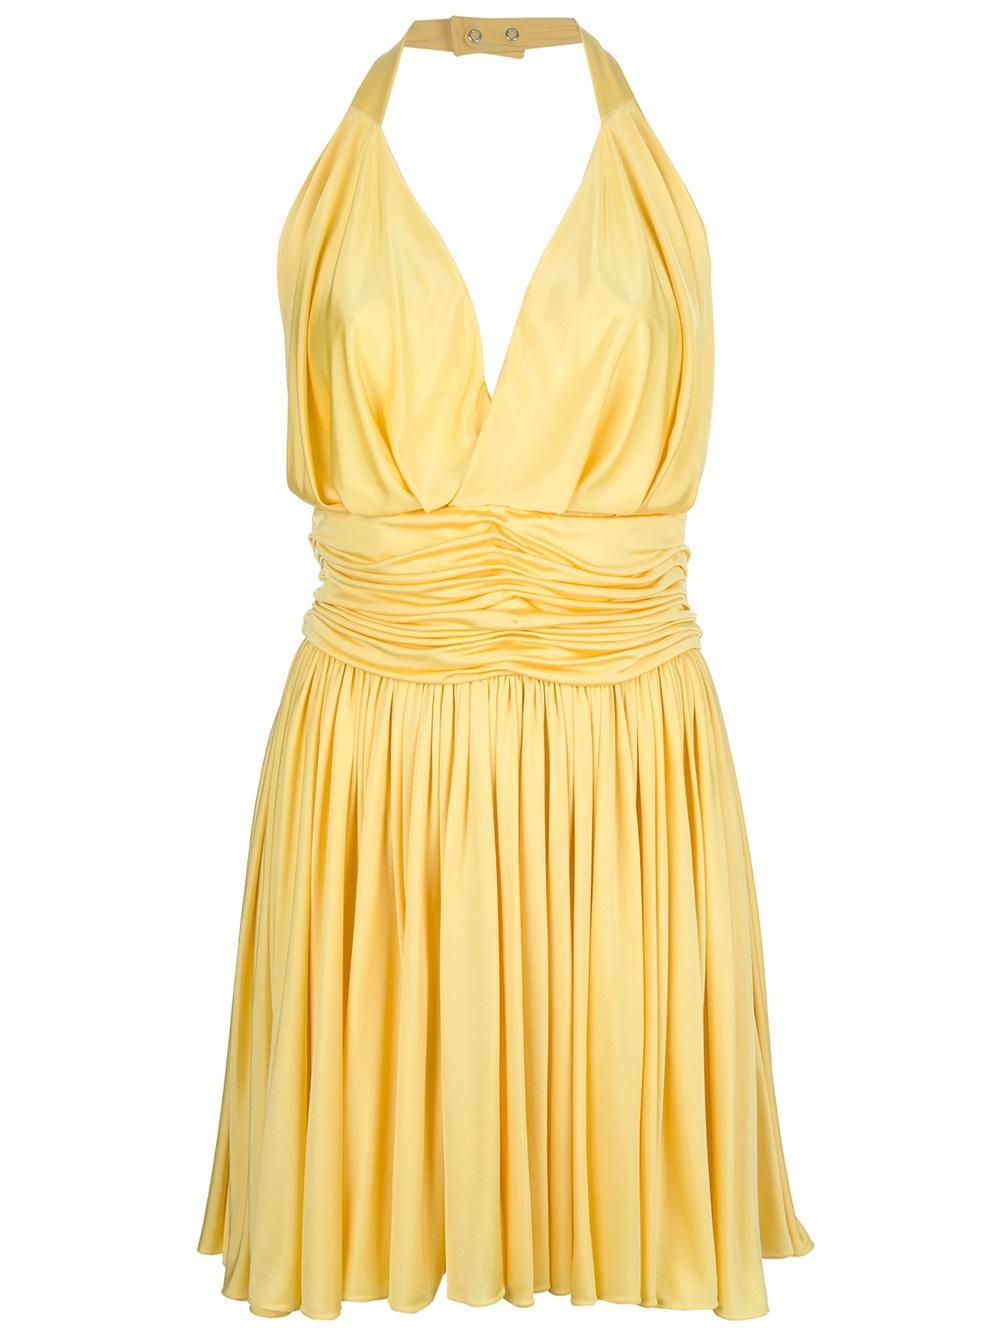 Balmain Halter Neck Dress In Yellow Lyst